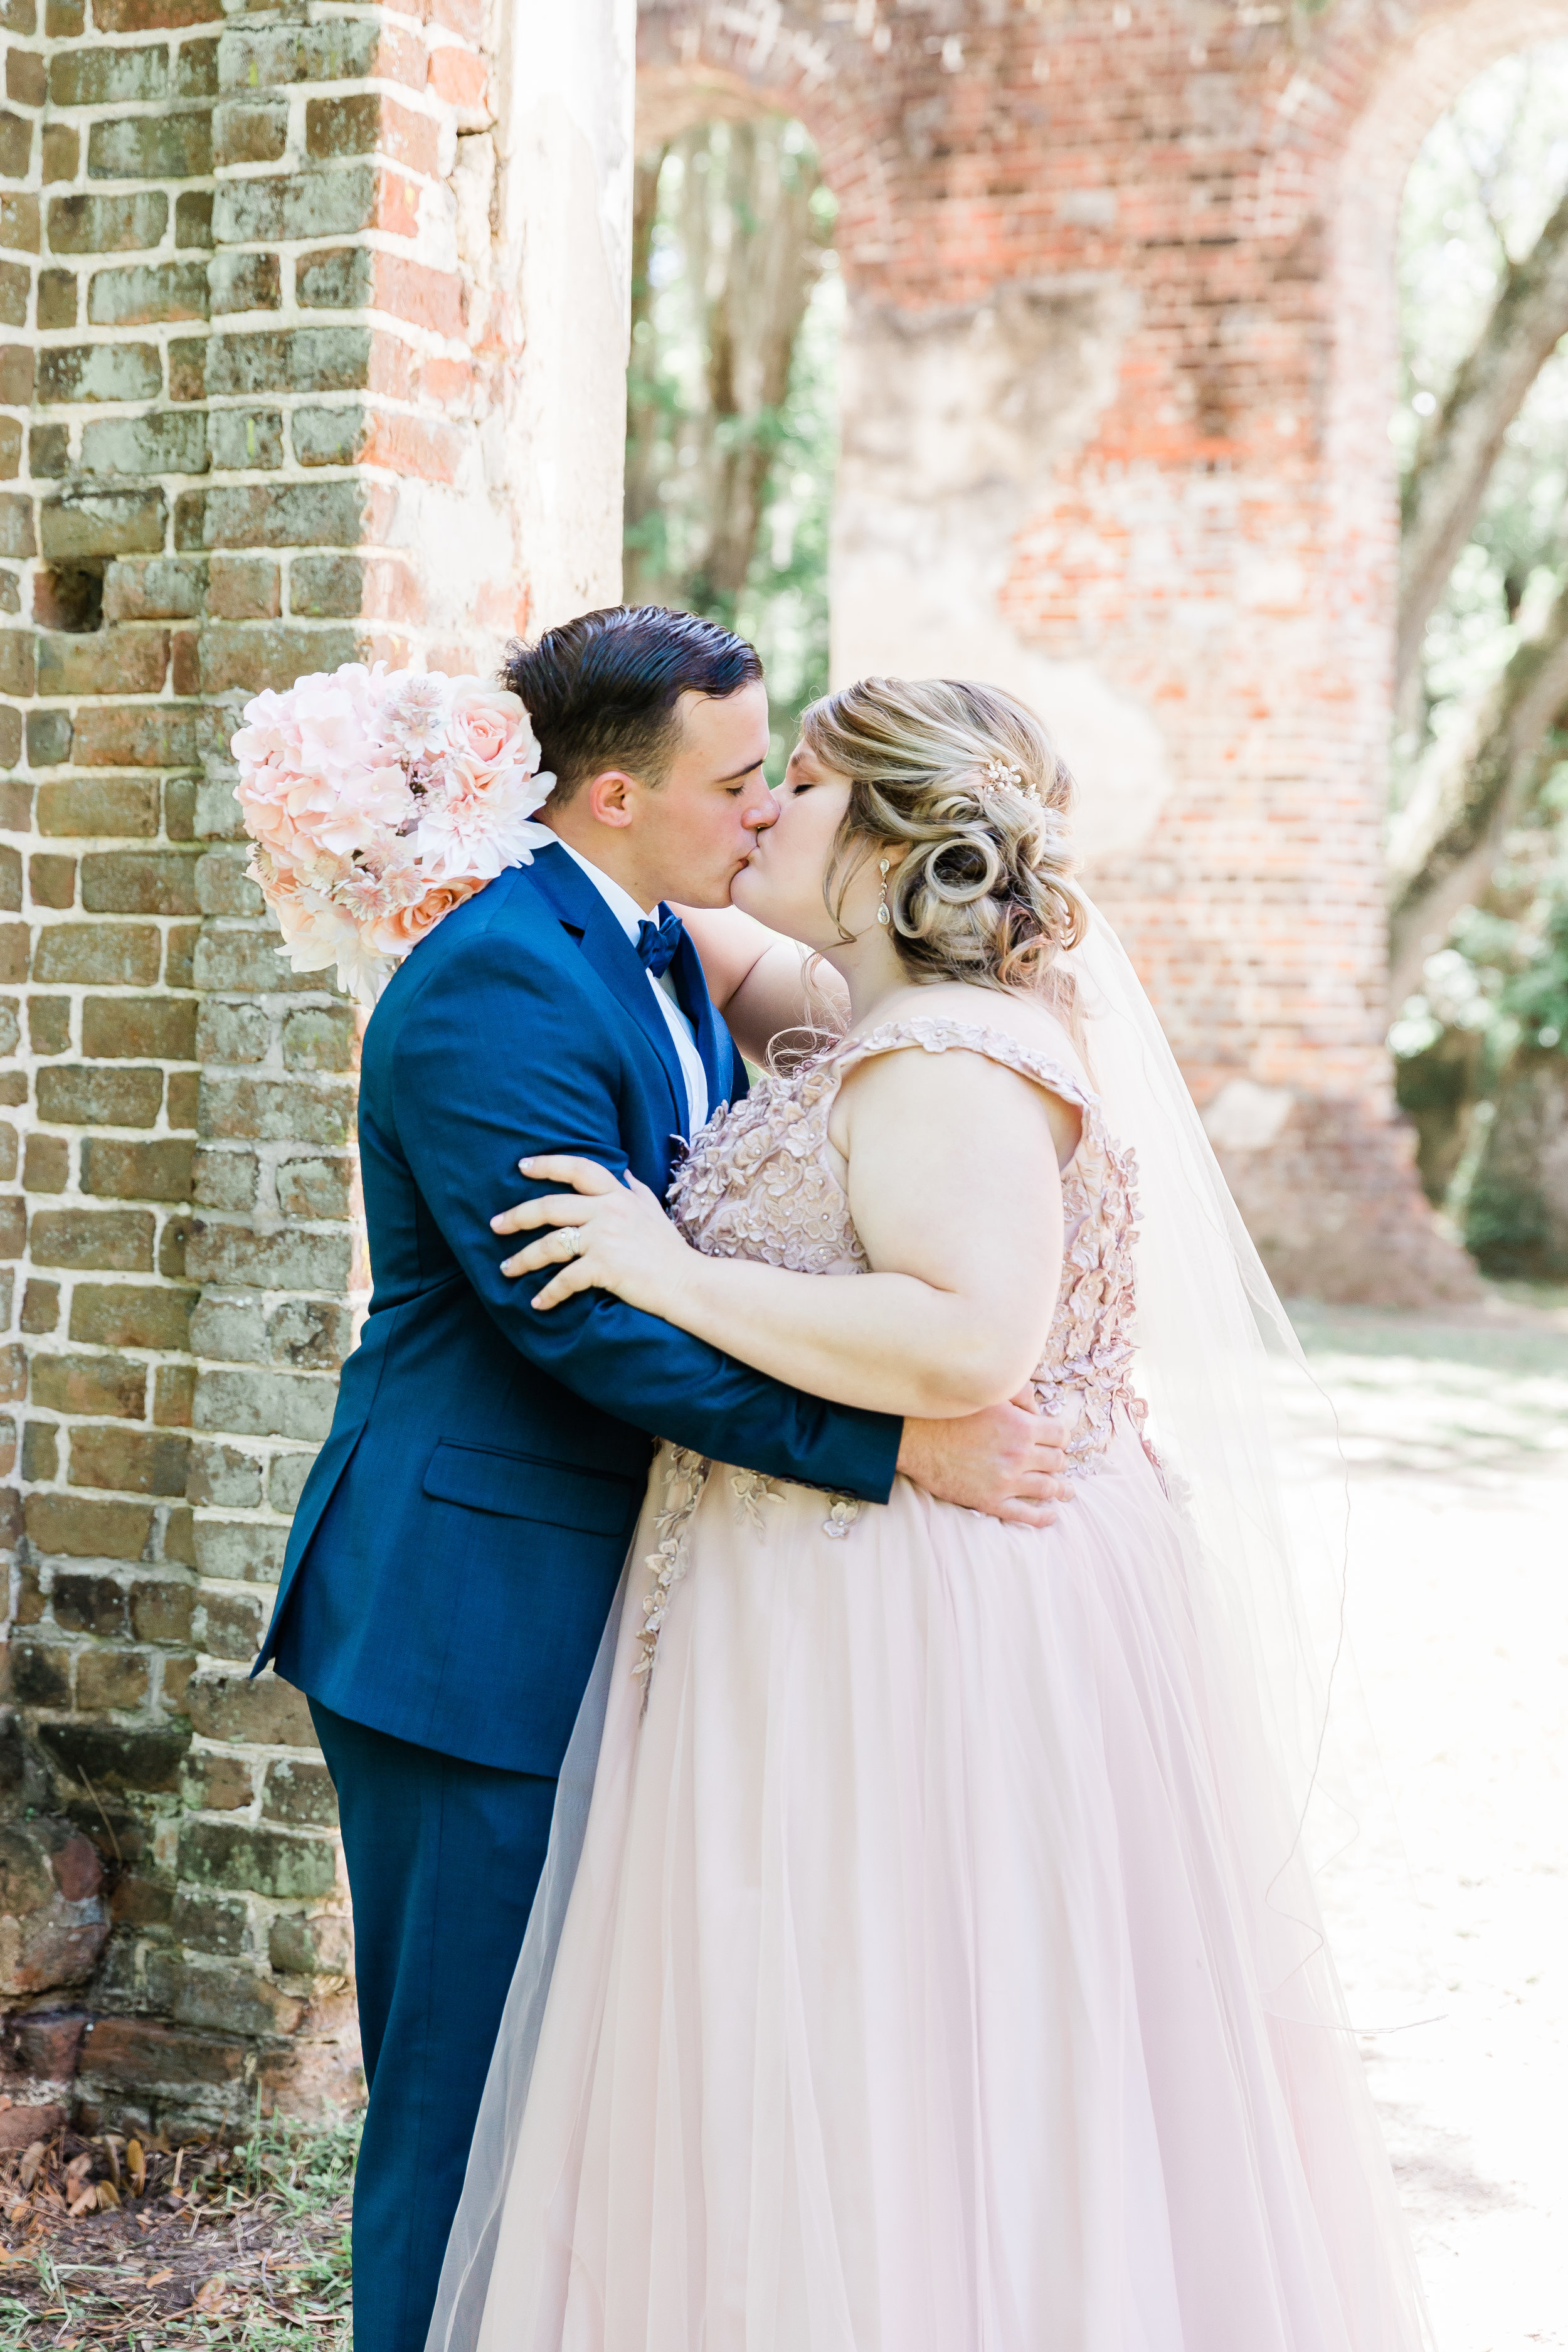 20190417-Southern Lens Photography-savannah family photographer- Ashley and Zack-old sheldon church ruins-201956.jpg